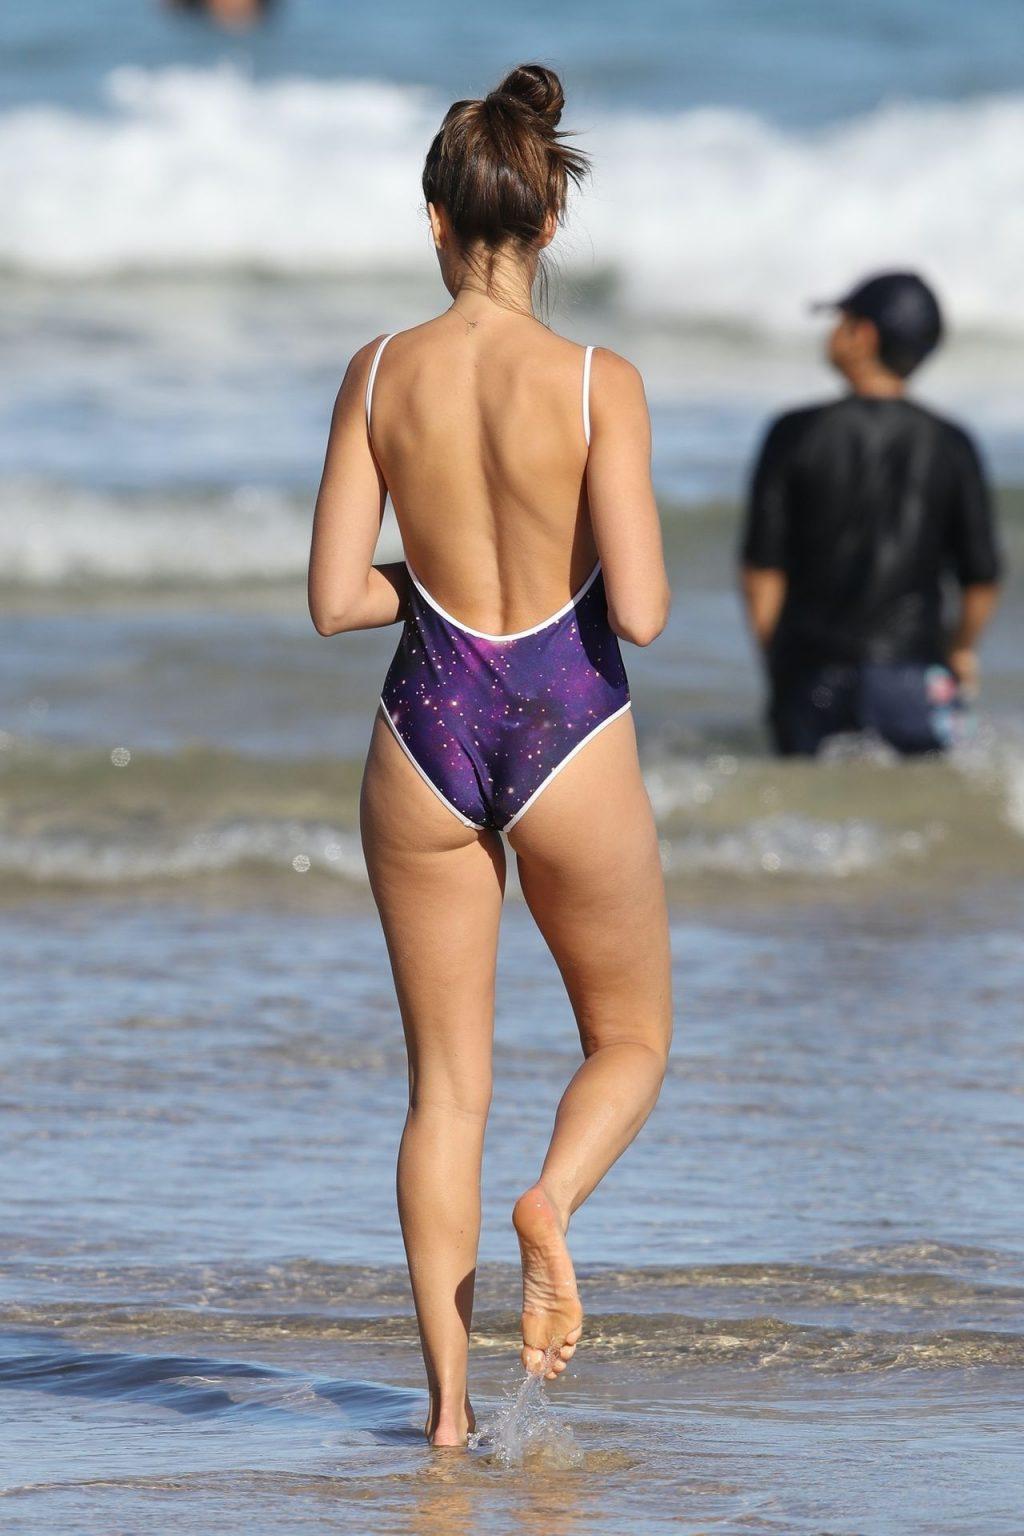 Rachael Finch Enjoys Her Beach Time with Husband in Bondi (37 Photos)